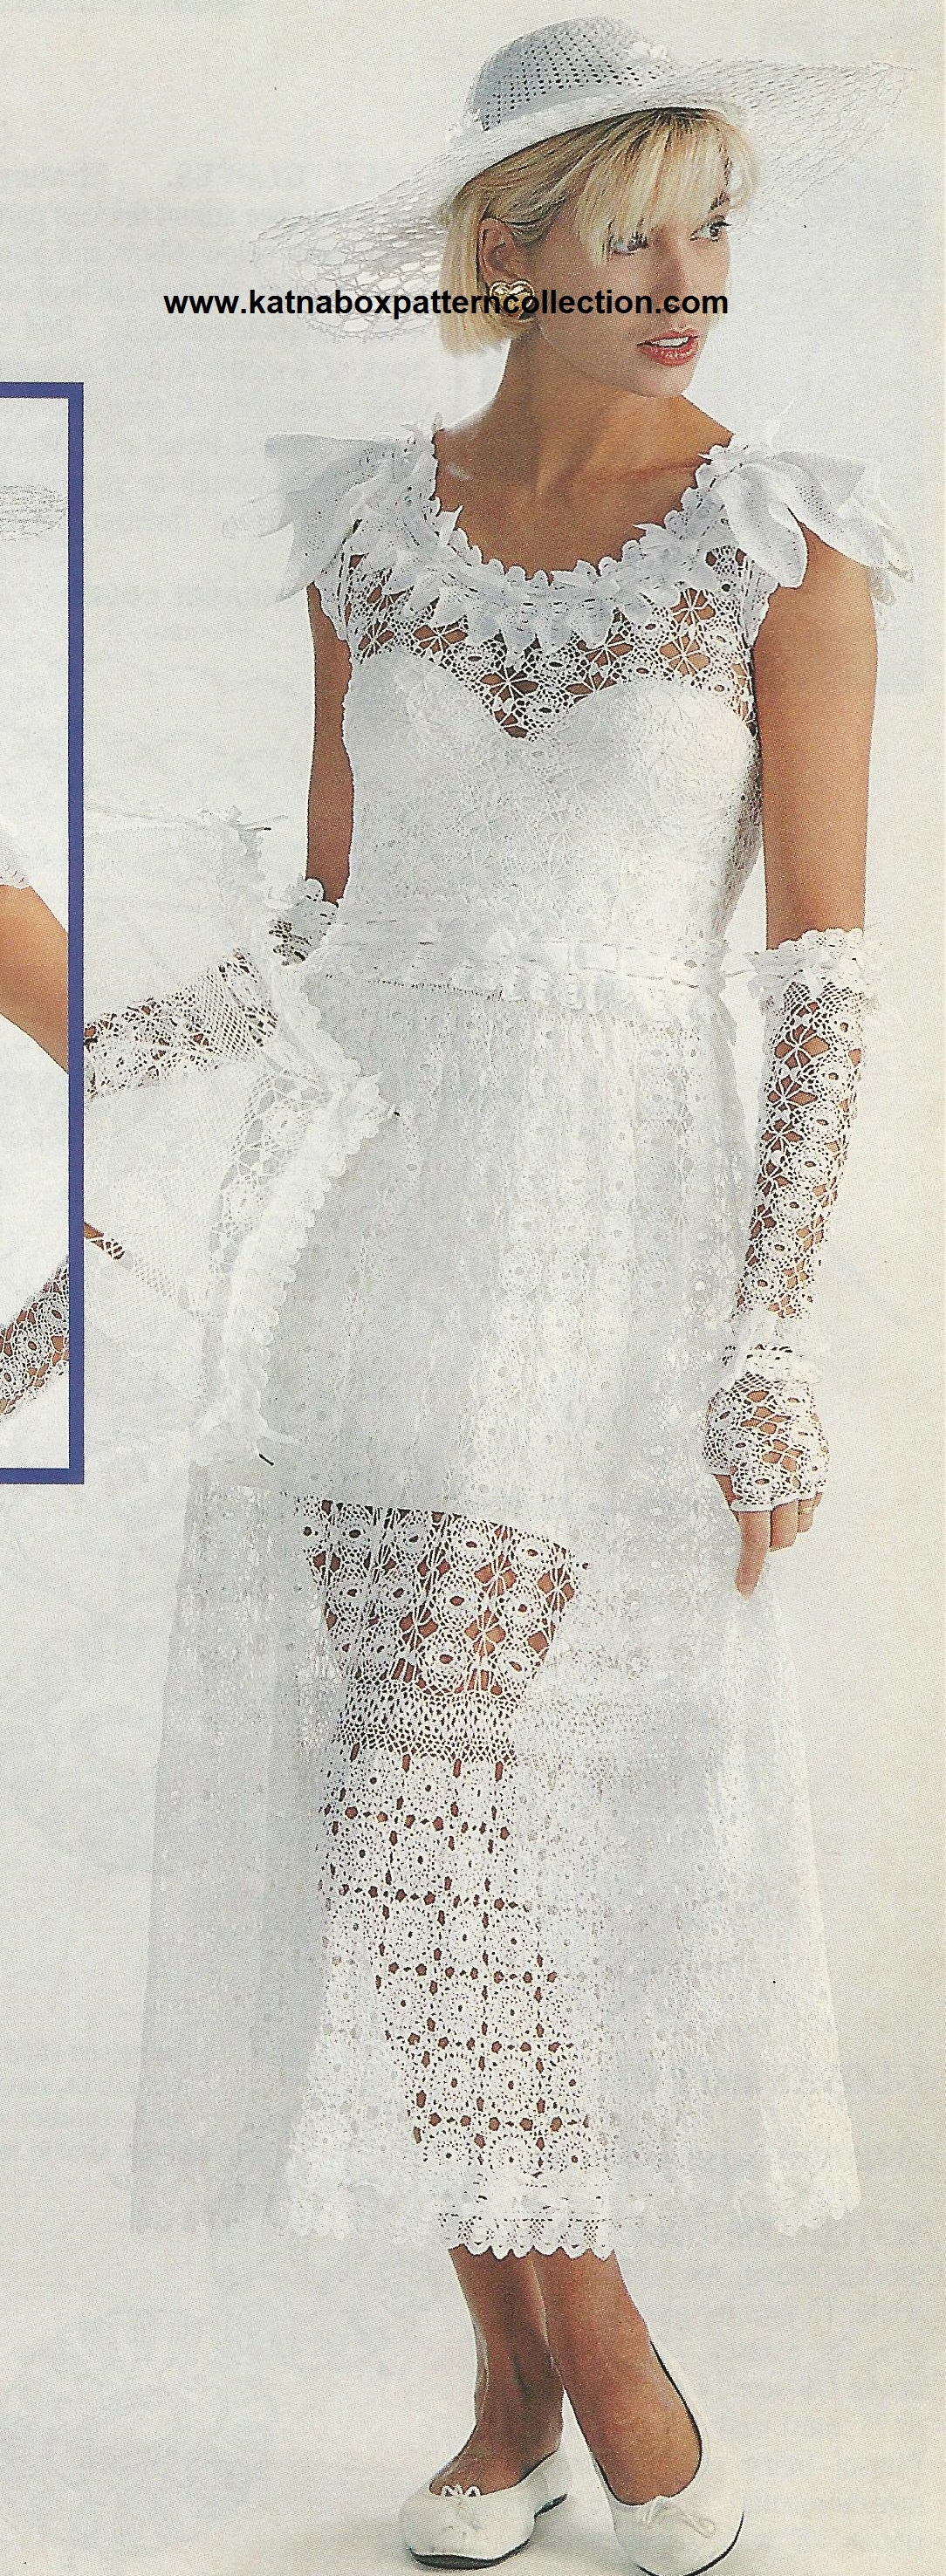 Crochet Wedding Dress Pattern.Crochet Bridal Dress Accessories Pattern Set Kc1504 Challenging Skill Level Crochet Pdf Pattern